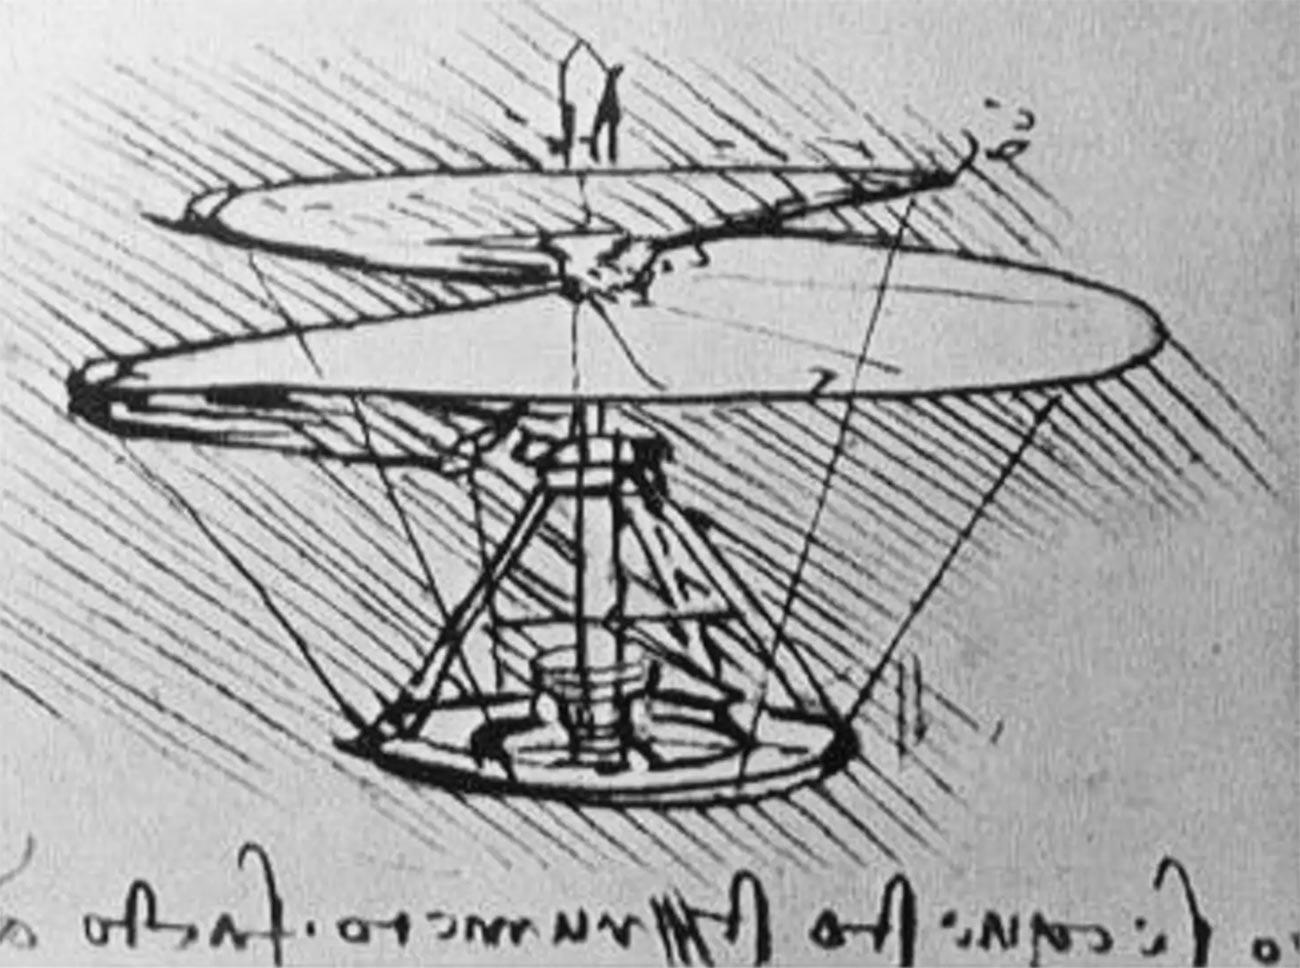 Leonardo da Vinci's prototype of a helicopter.